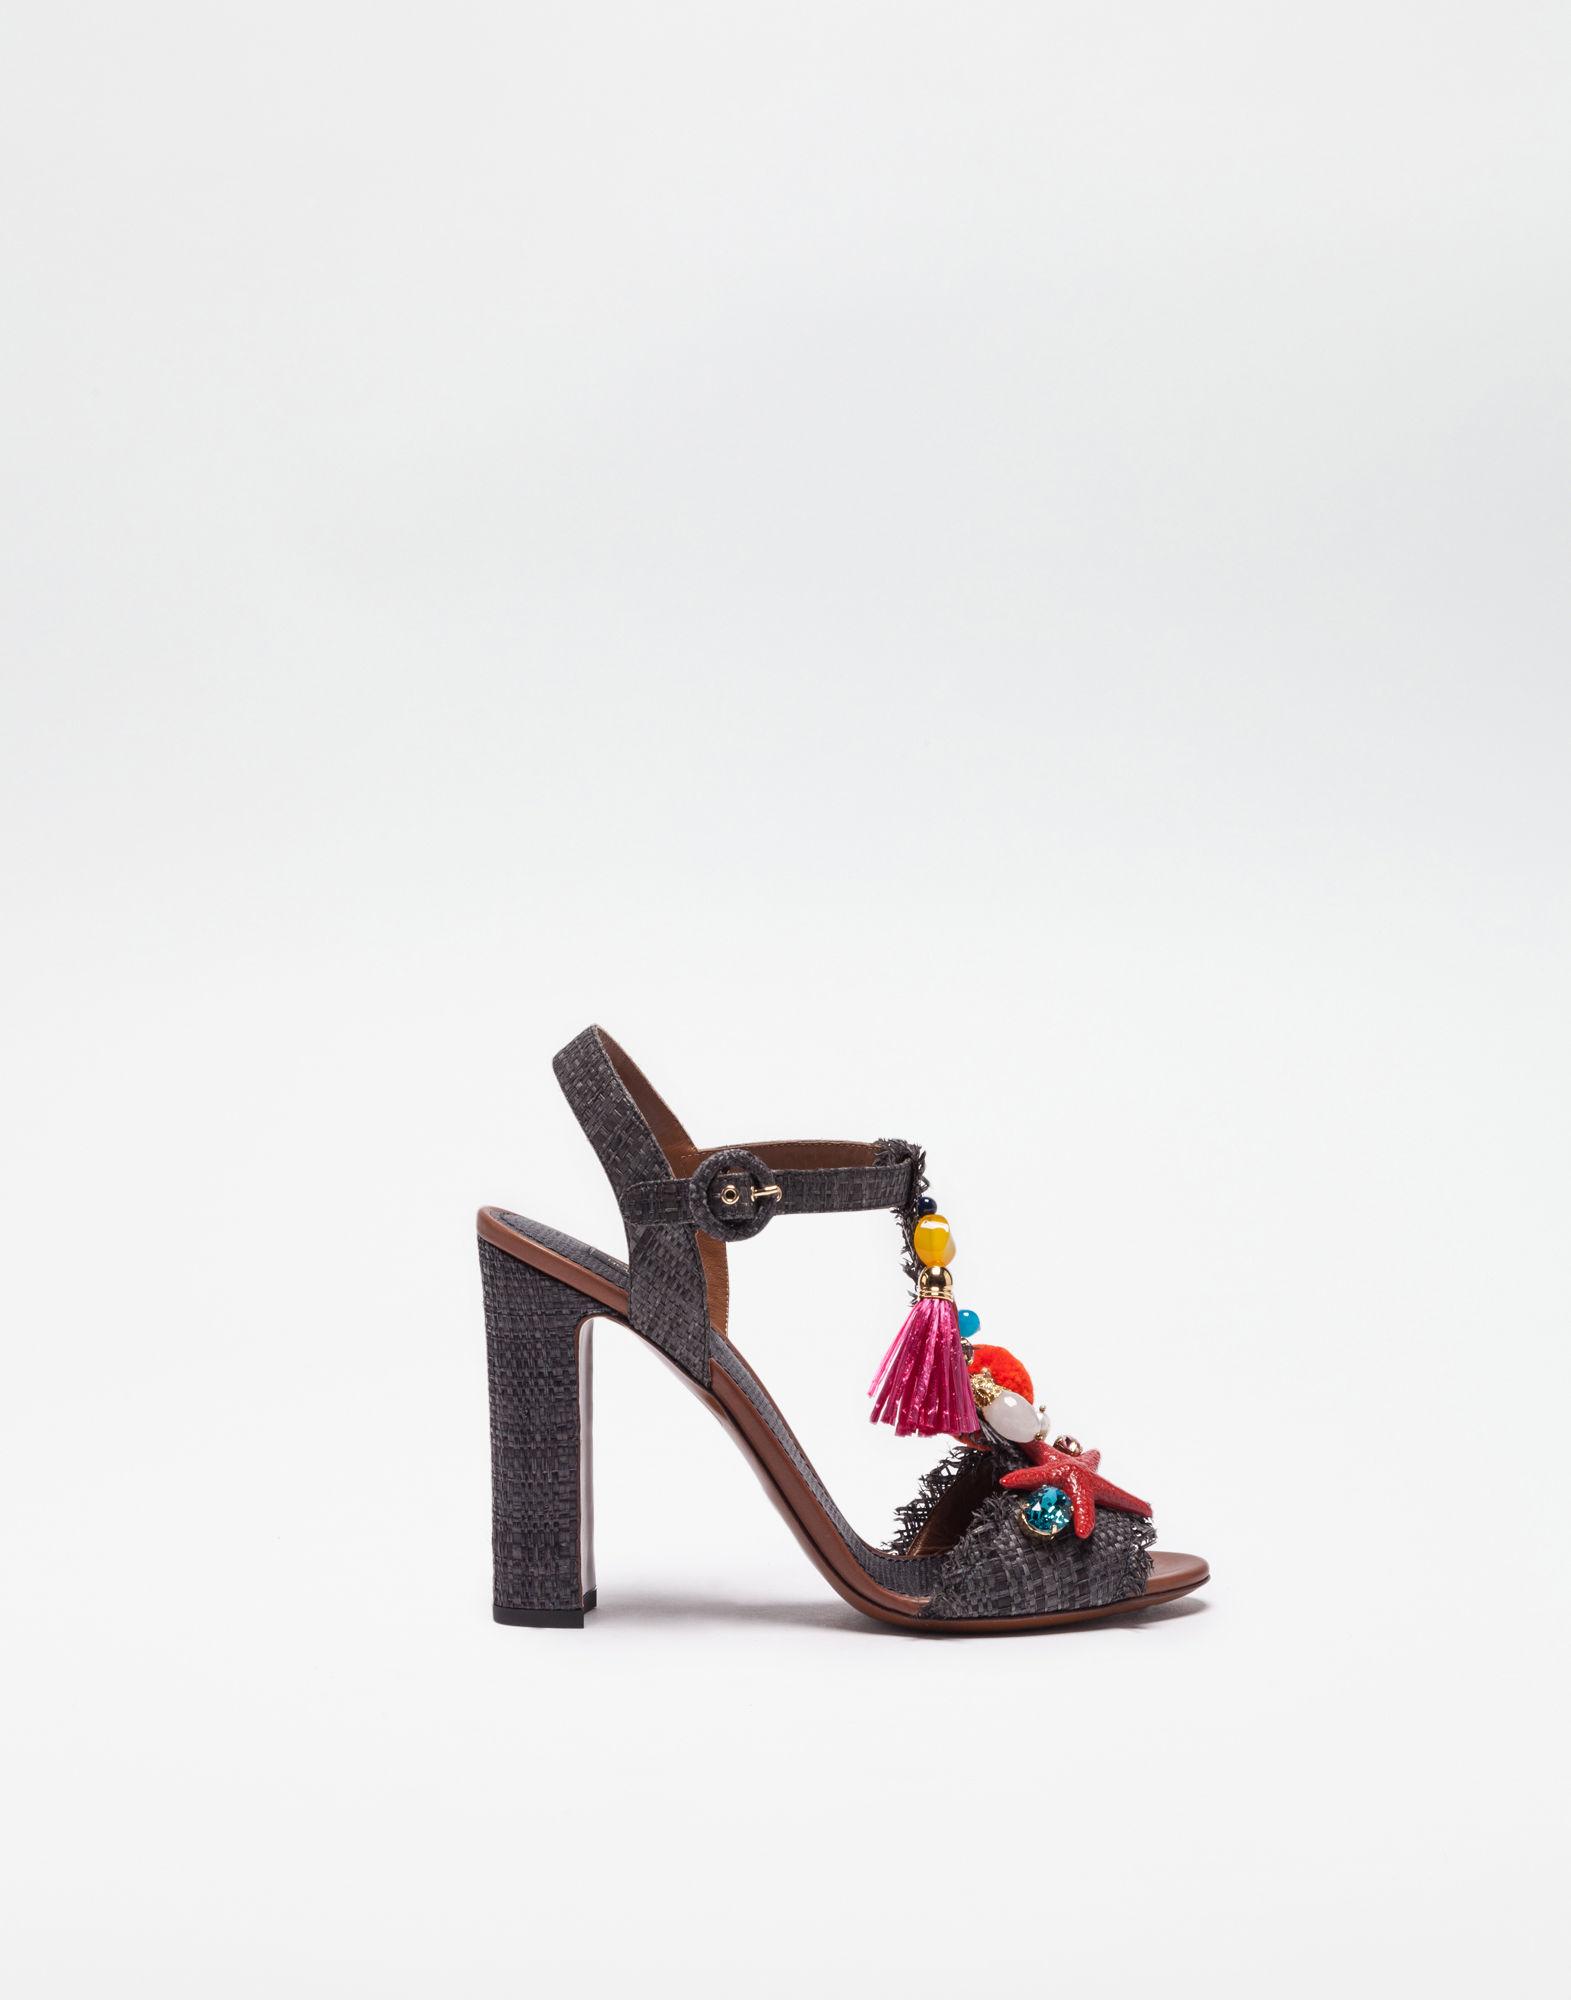 Printed Crepe Sandals With Sculpted HeelDolce & Gabbana vRN7TgFE